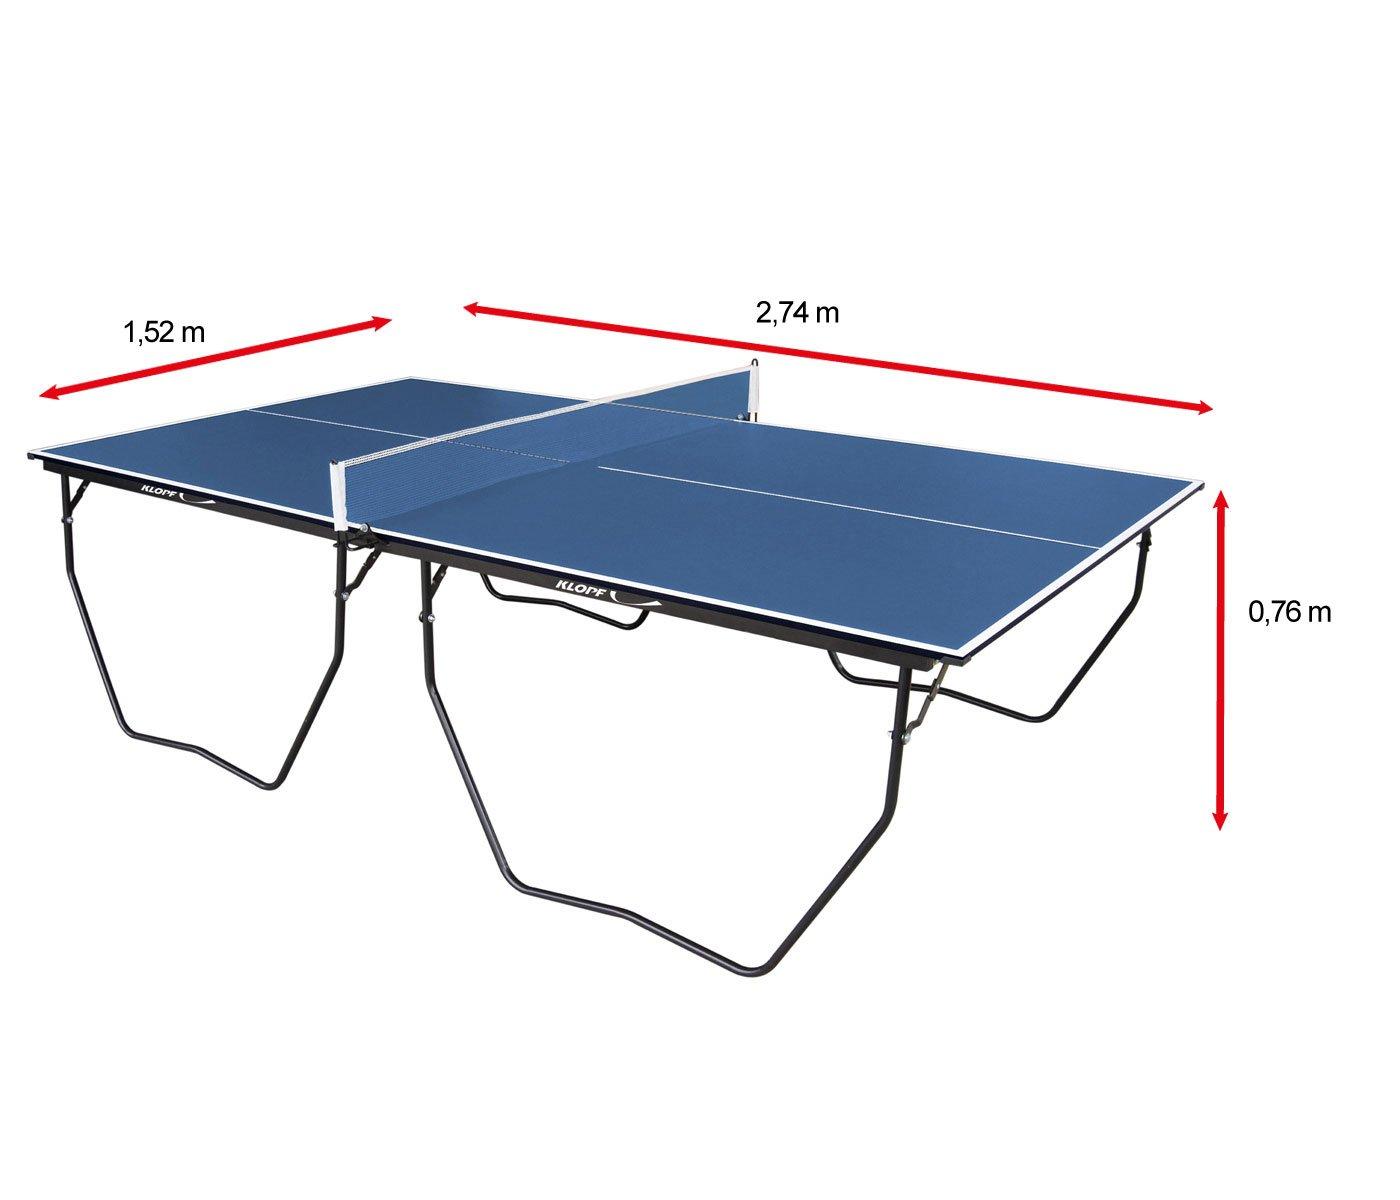 05c1f682b -10%. Mesa de Ping Pong   Tênis de Mesa Klopf c  Rodízio MDP - 15 mm